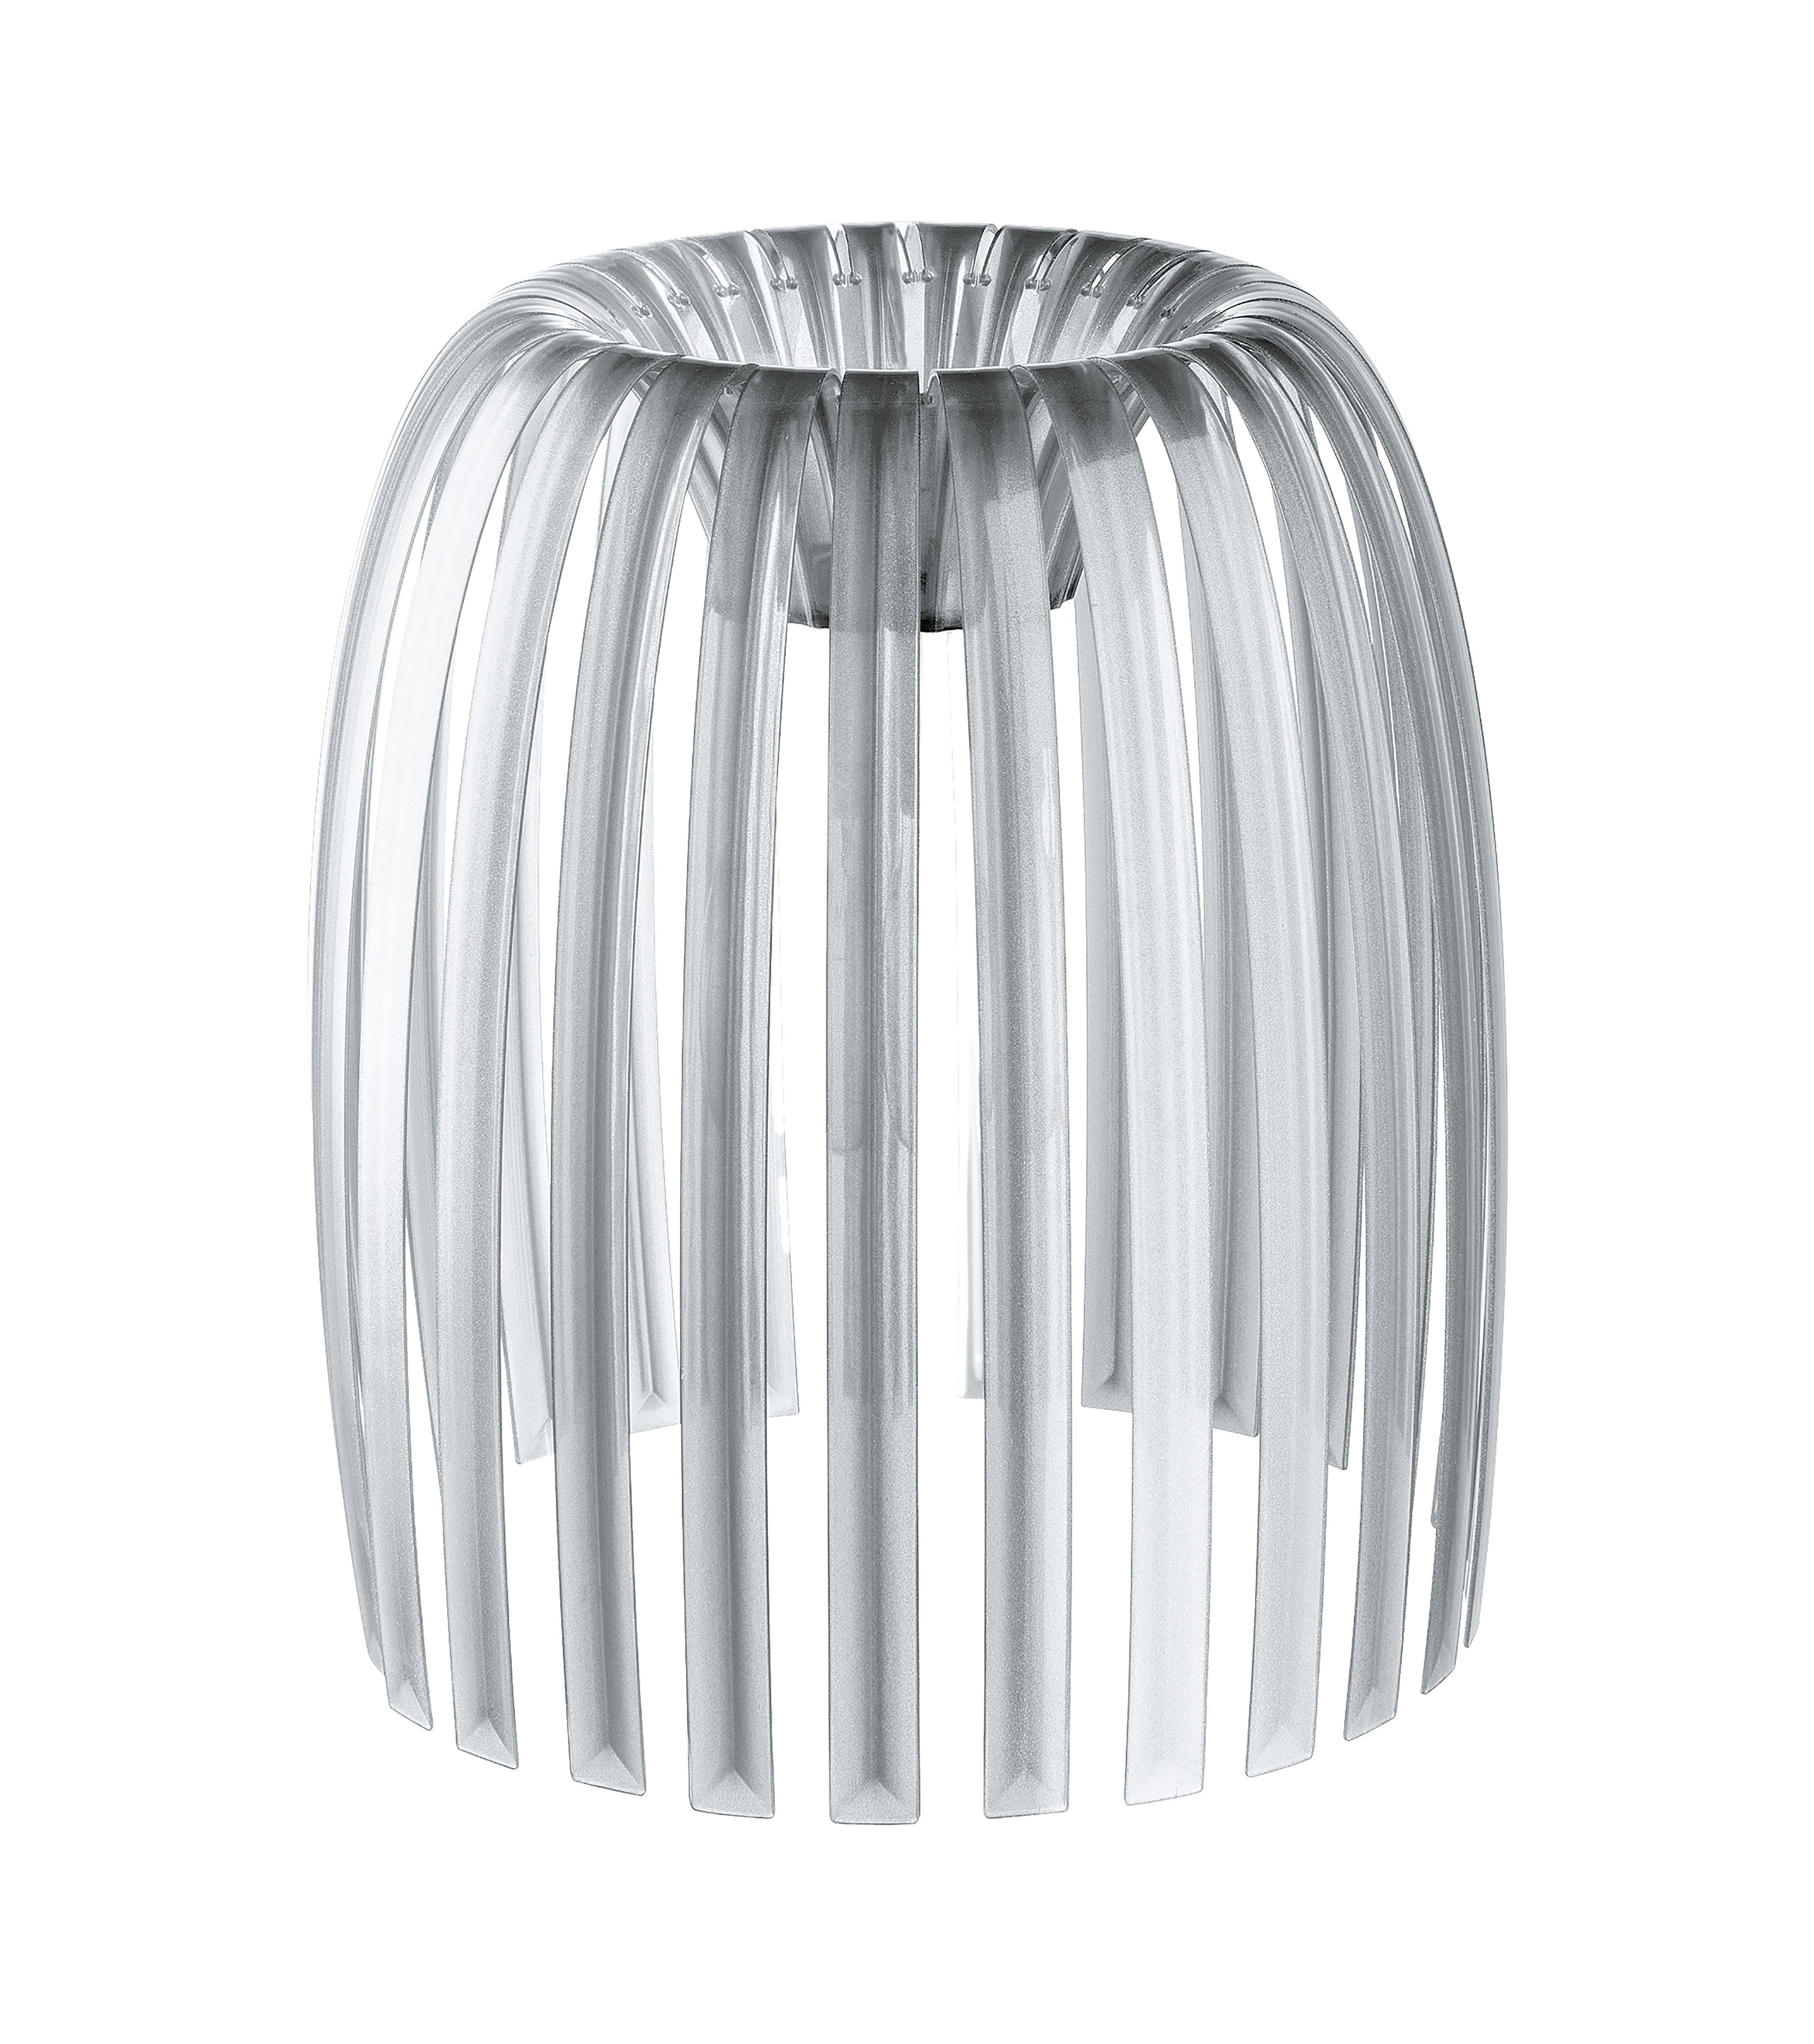 Luminaire - Suspensions - Abat-jour Josephine Medium / Ø 31 x H 34 cm - Koziol - Transparent - Polyéthylène